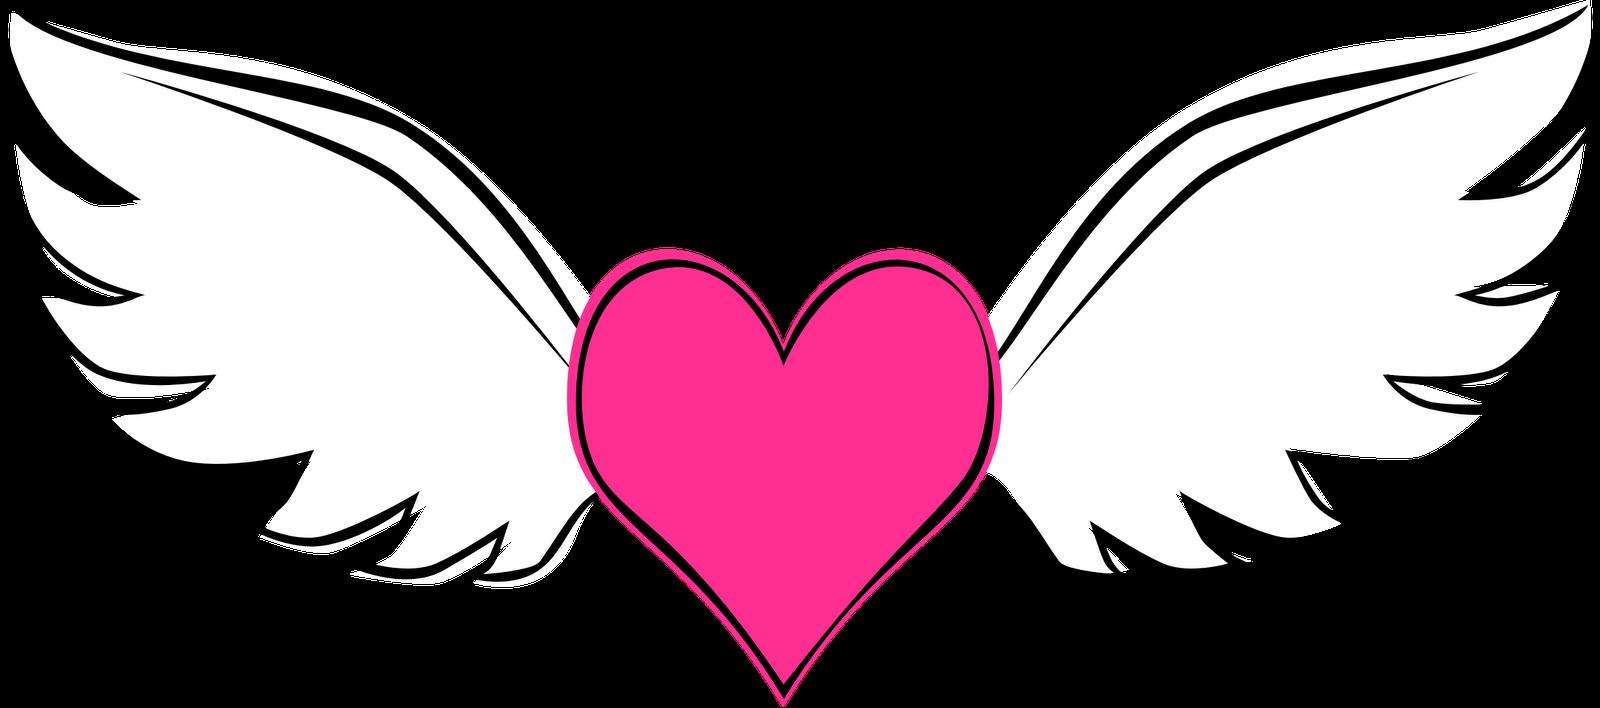 Heart tattoo designs png clipart best for Transparent top design